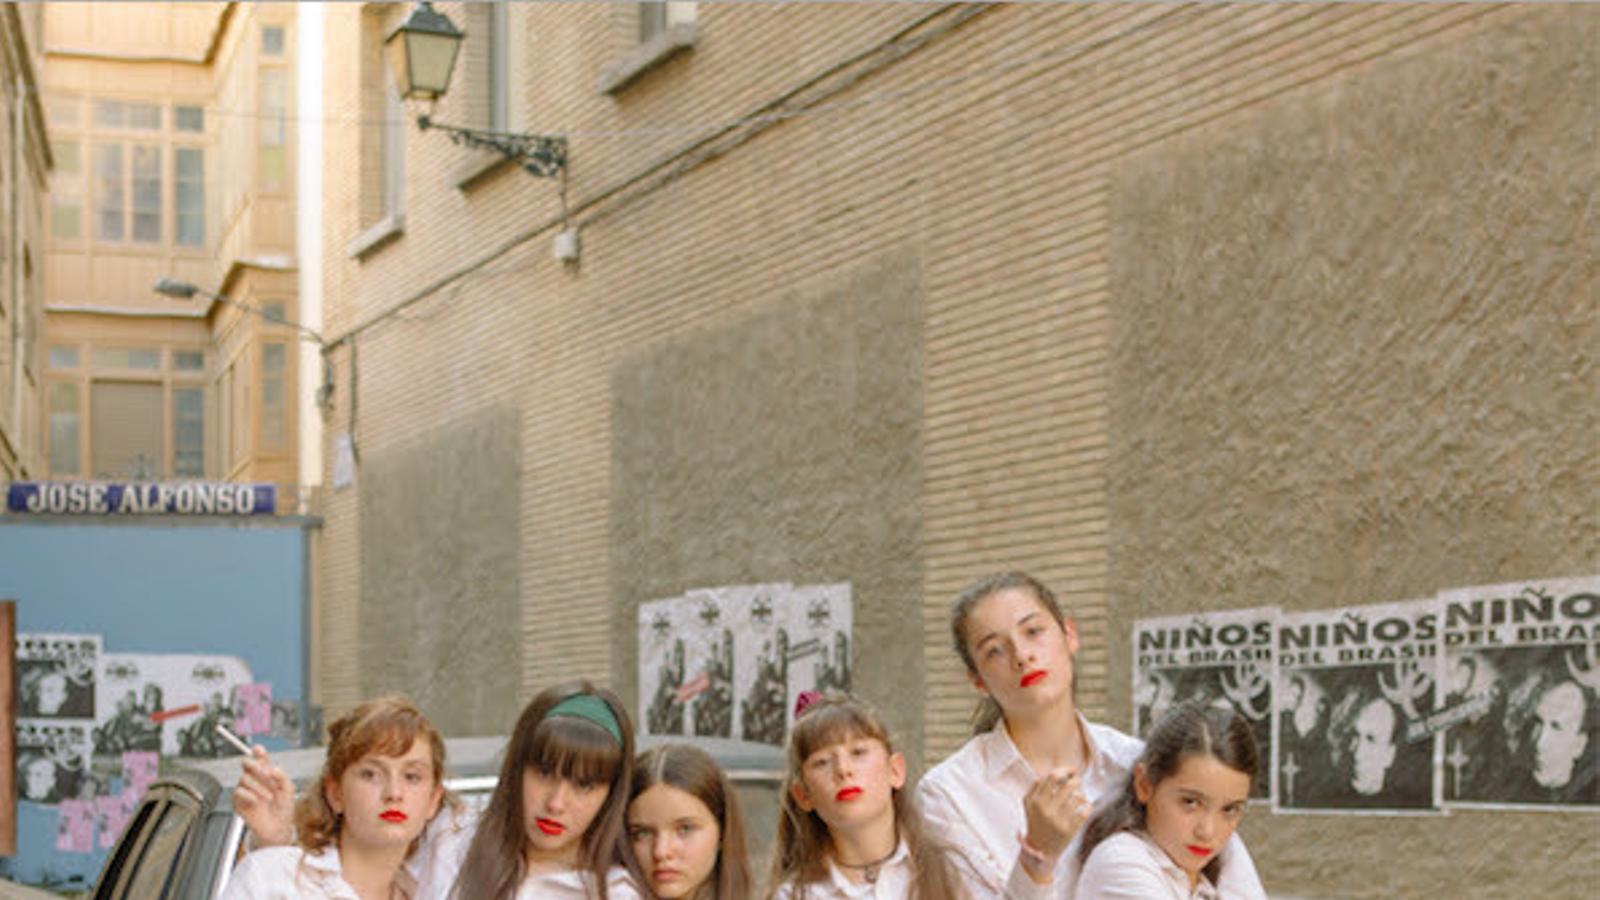 'Las niñas': descobrir el món adult a la Saragossa del 1992